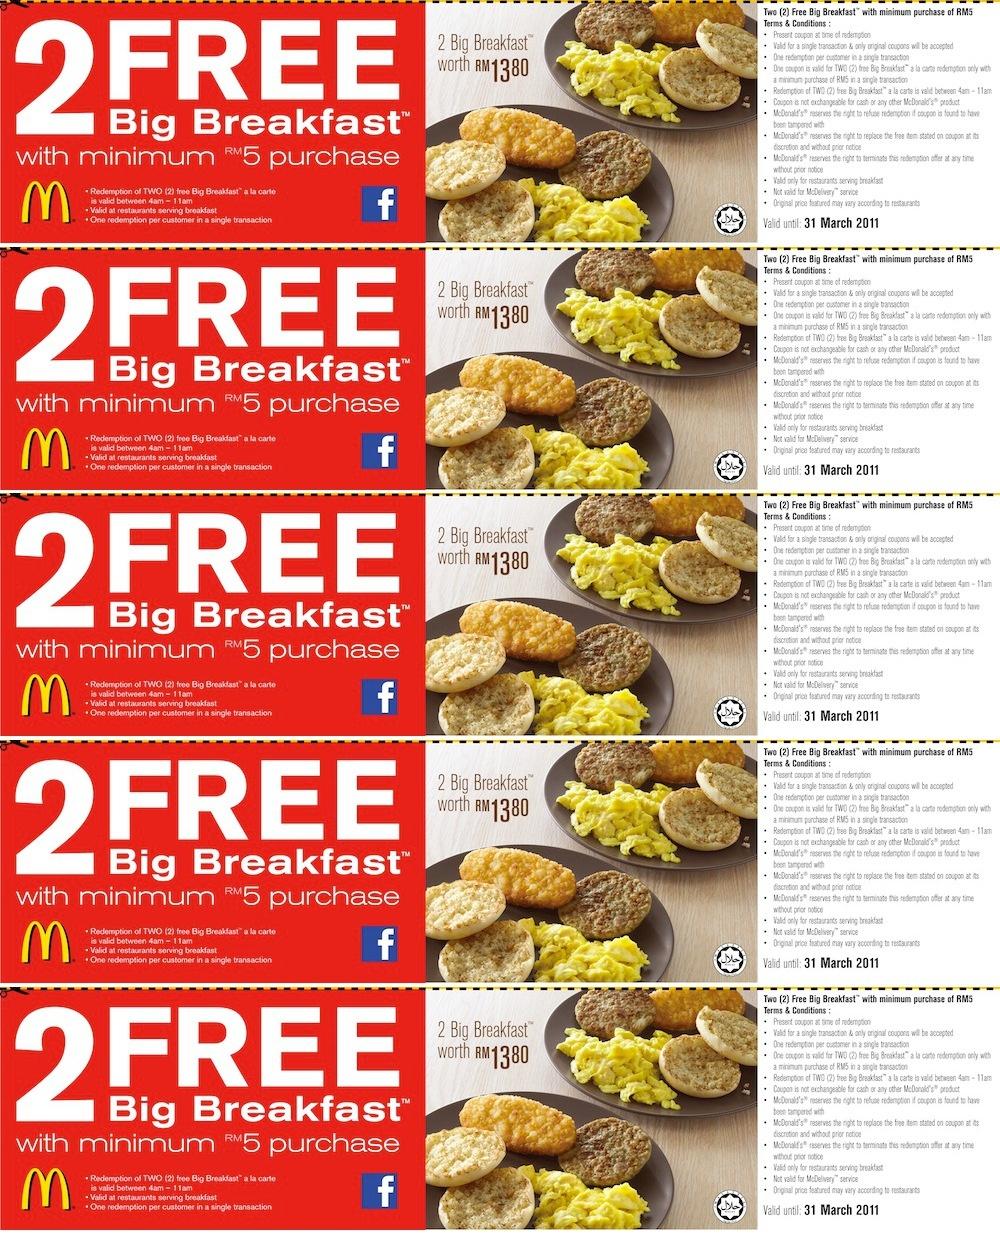 Mcdonalds Coupons Breakfast 2019 - Free Printable Mcdonalds Coupons Online